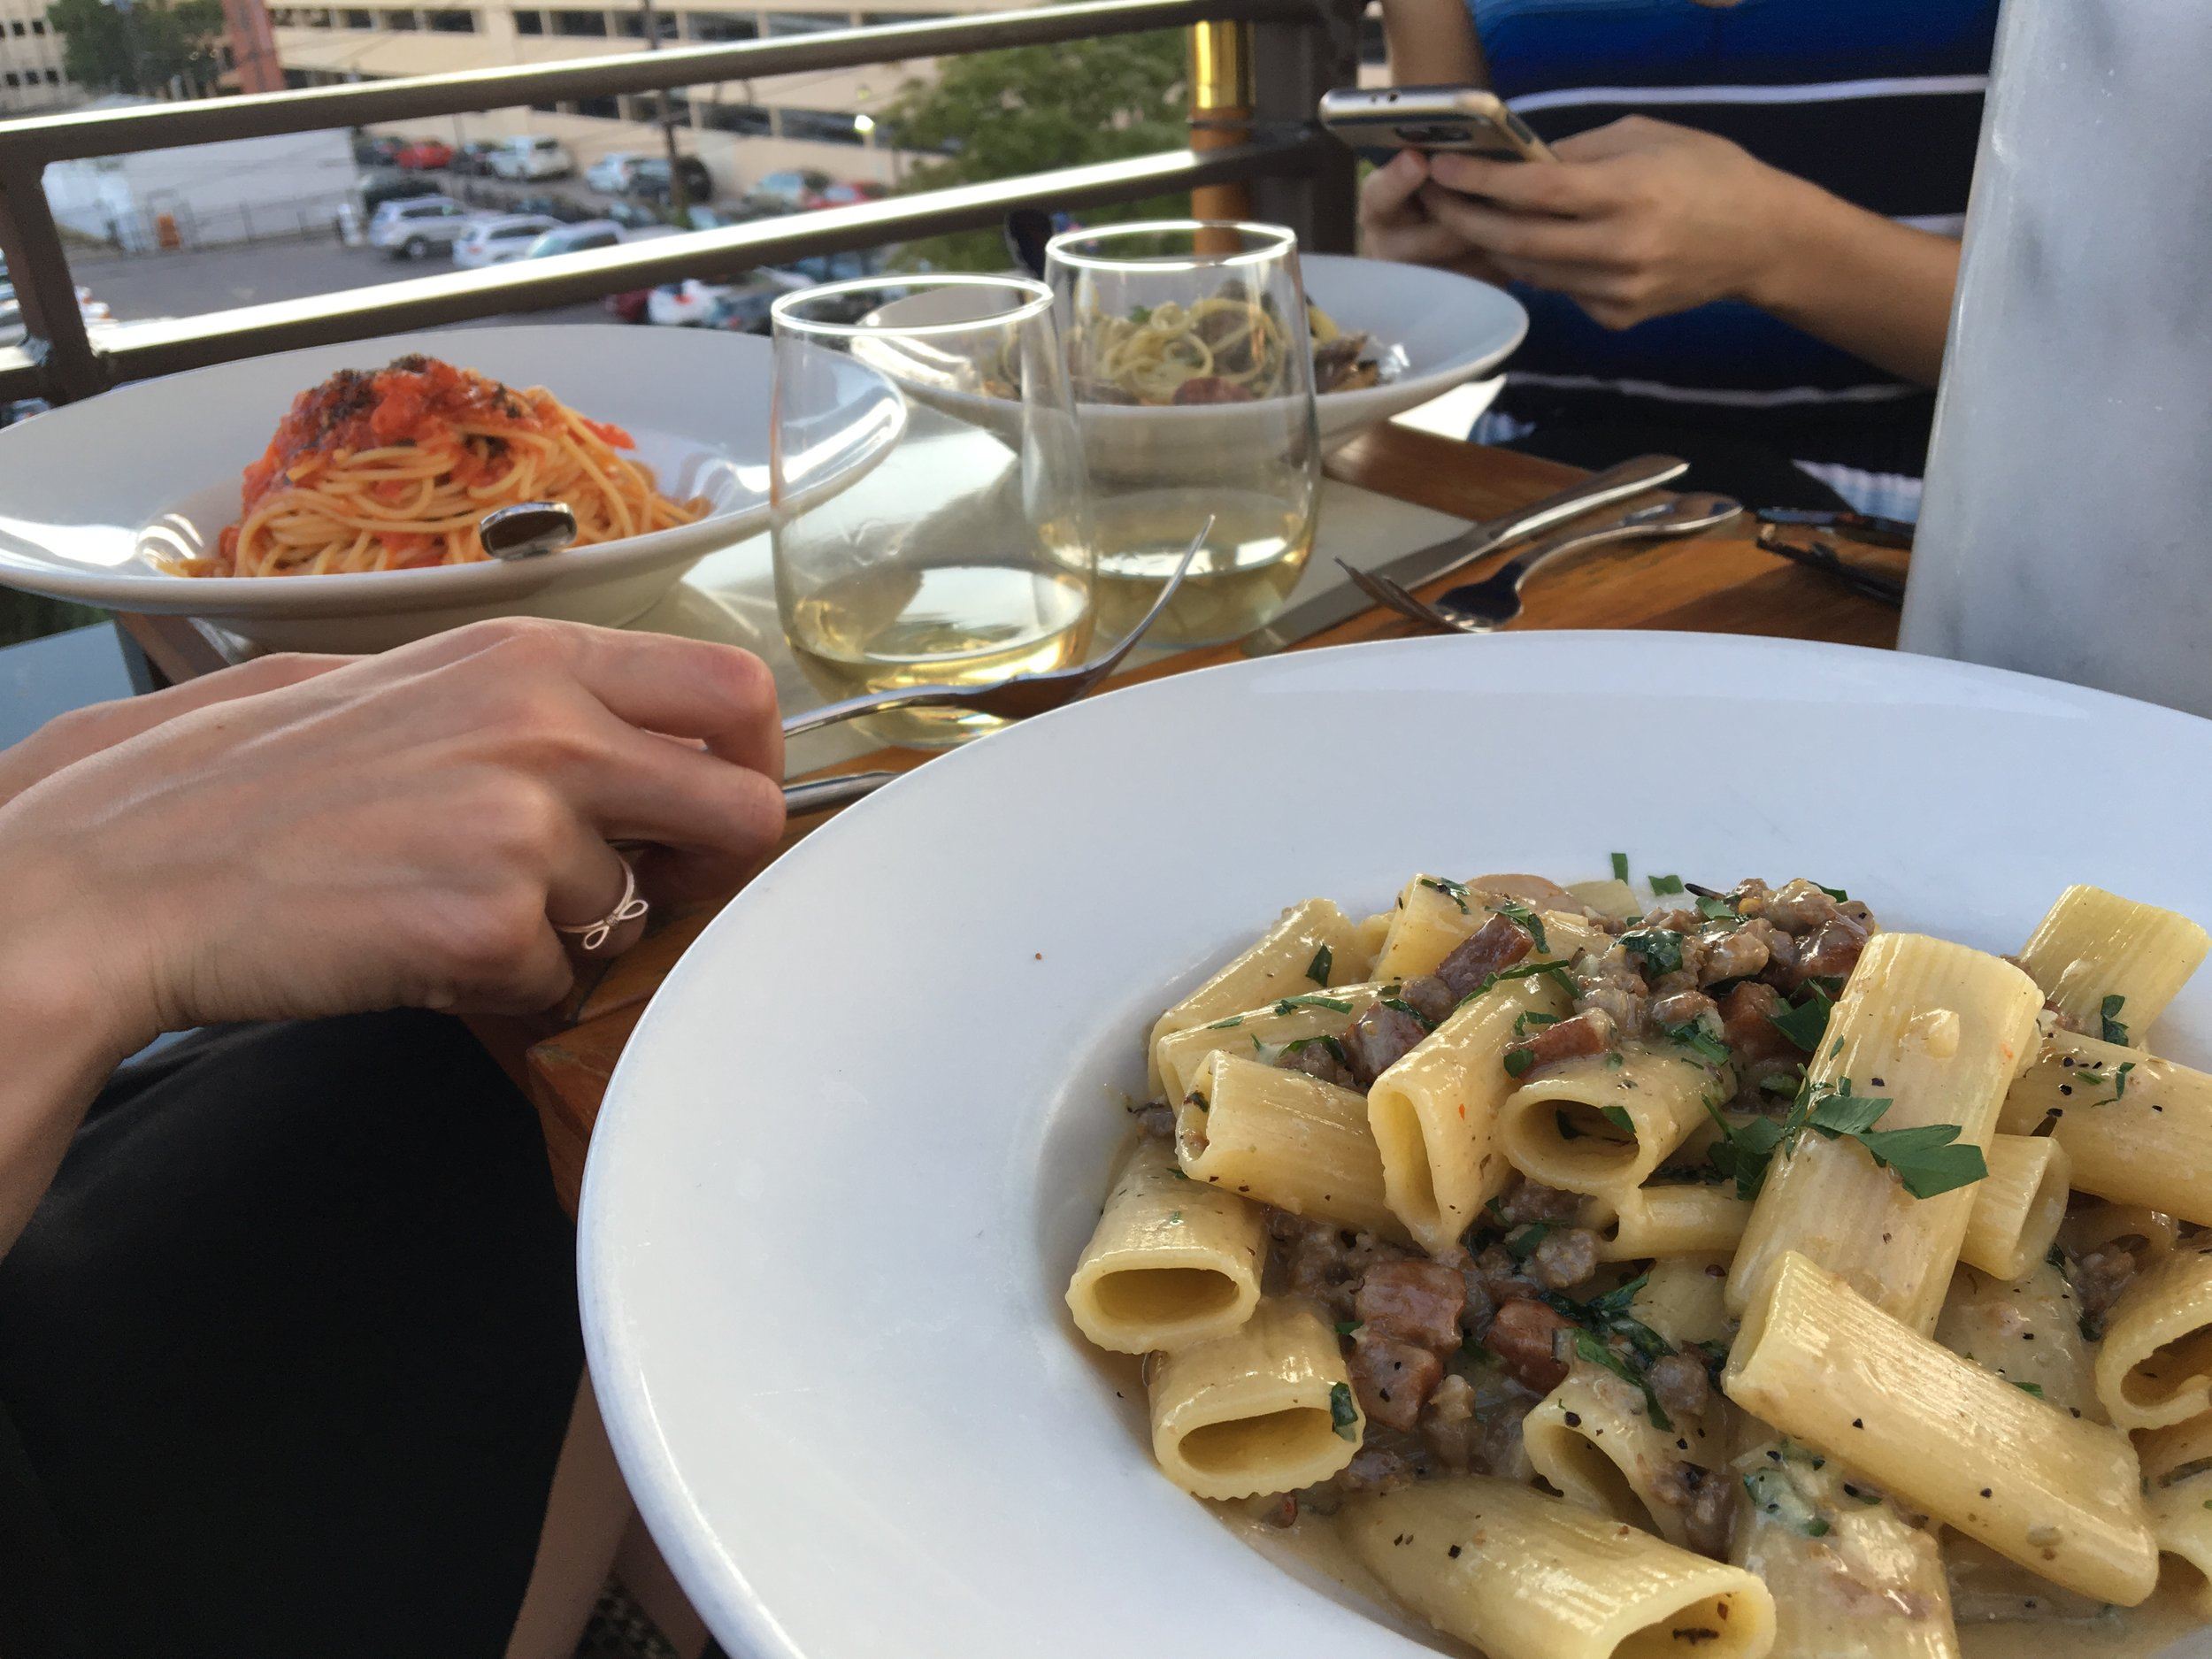 Dinner at Louis Ristorante & Bar